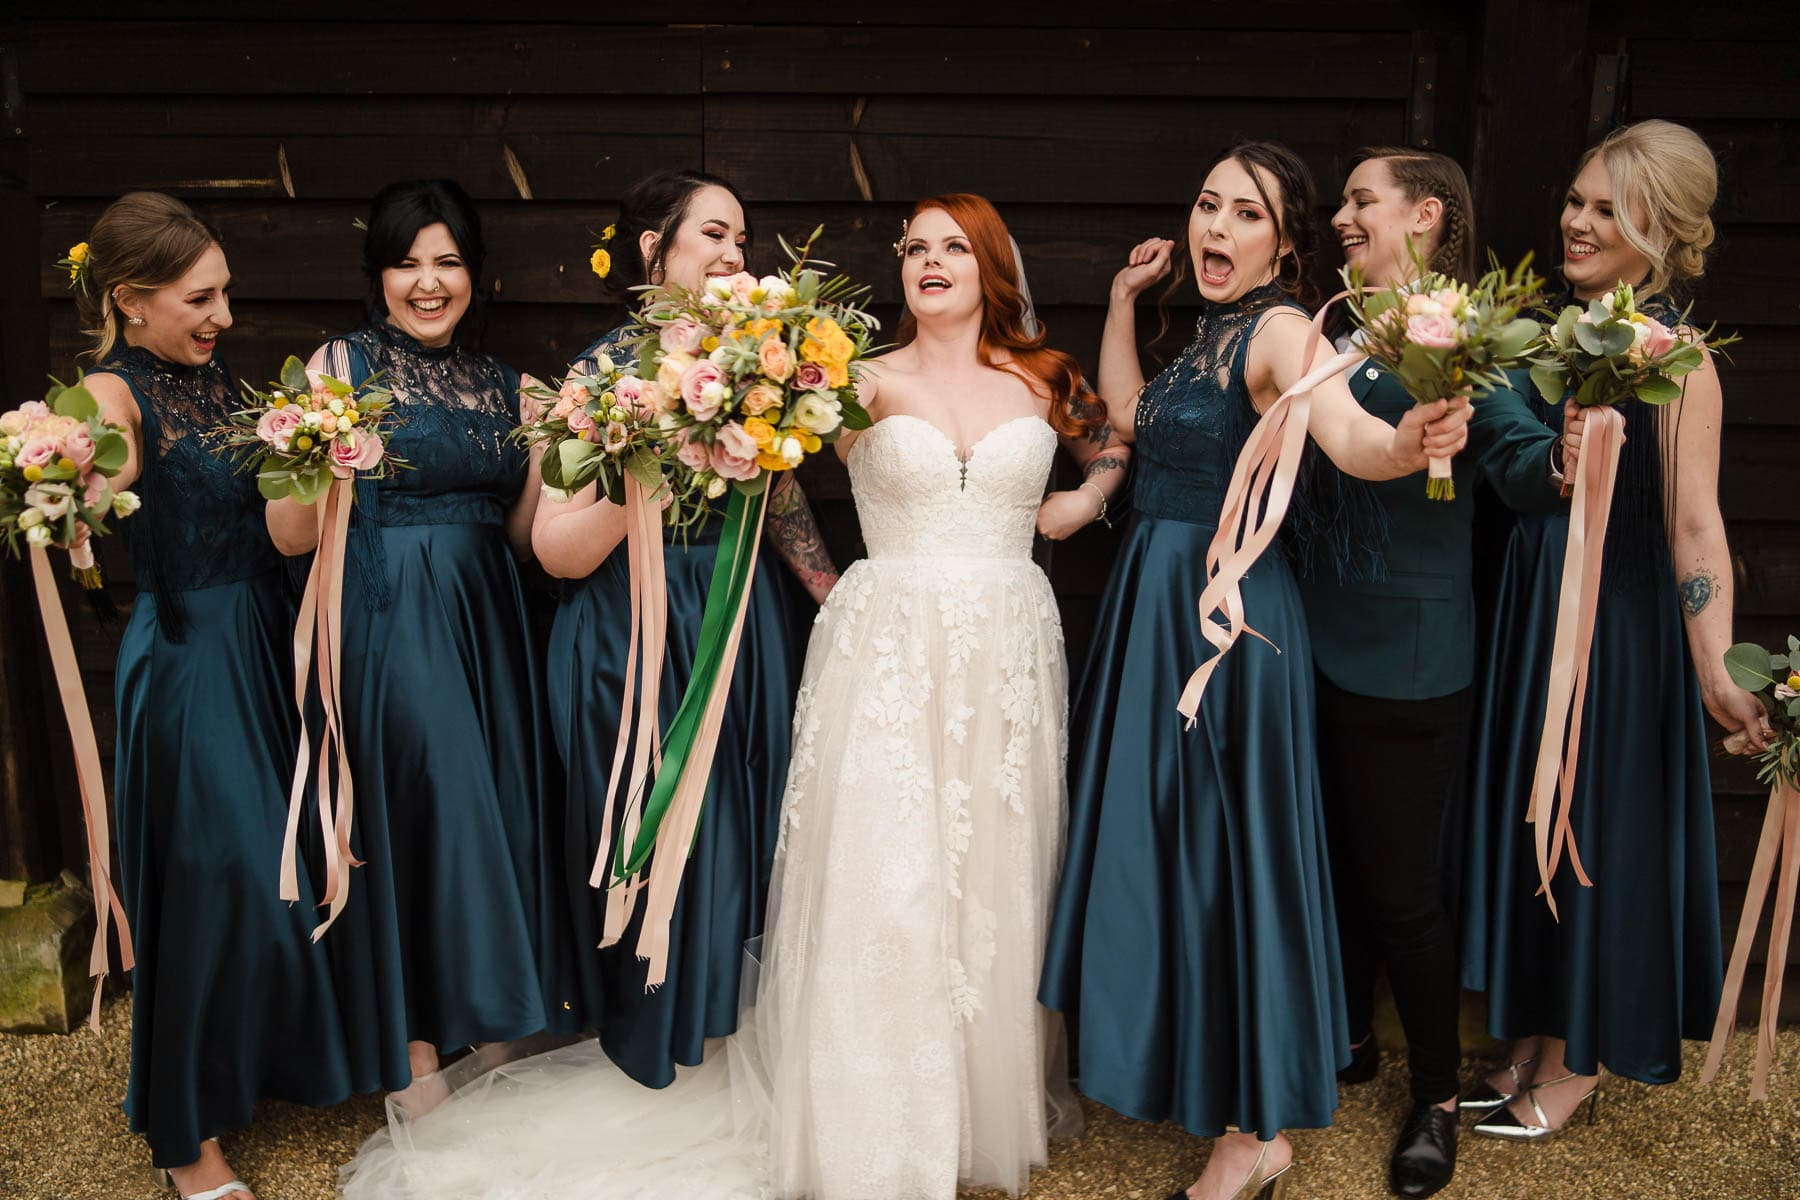 Alternative Wedding Photographer taking photos of bridesmaids